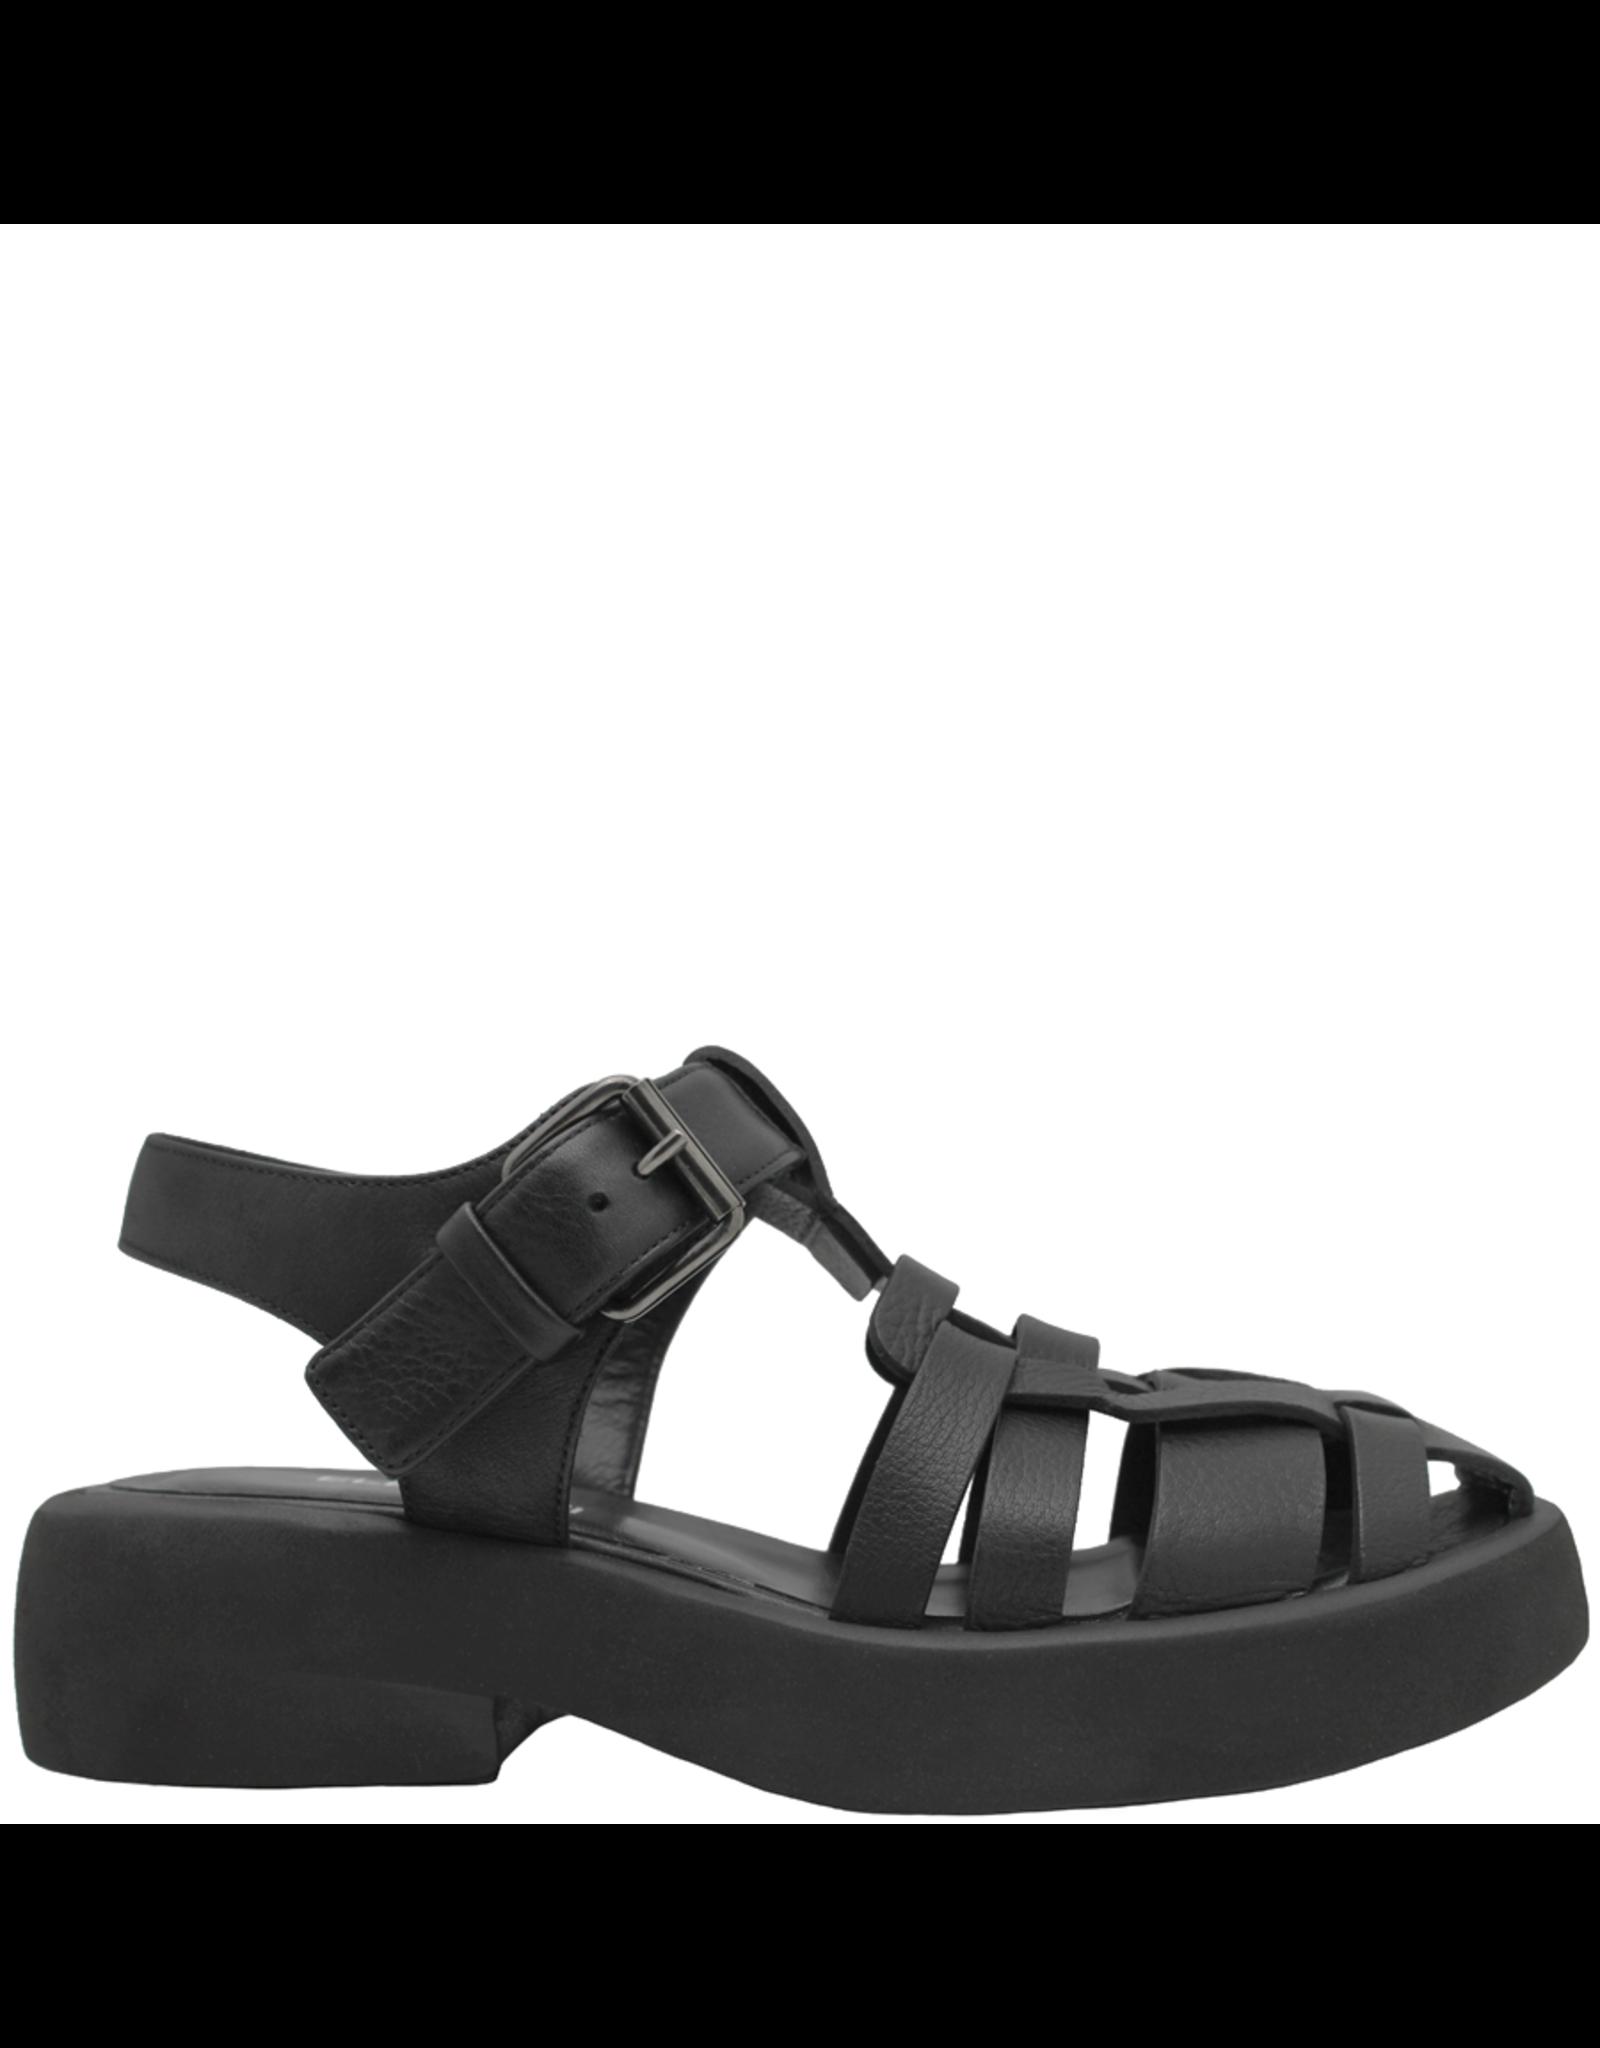 Elena Iachi ElenaIachi-Black Closed Toe Sling Flatform Sandal 2815